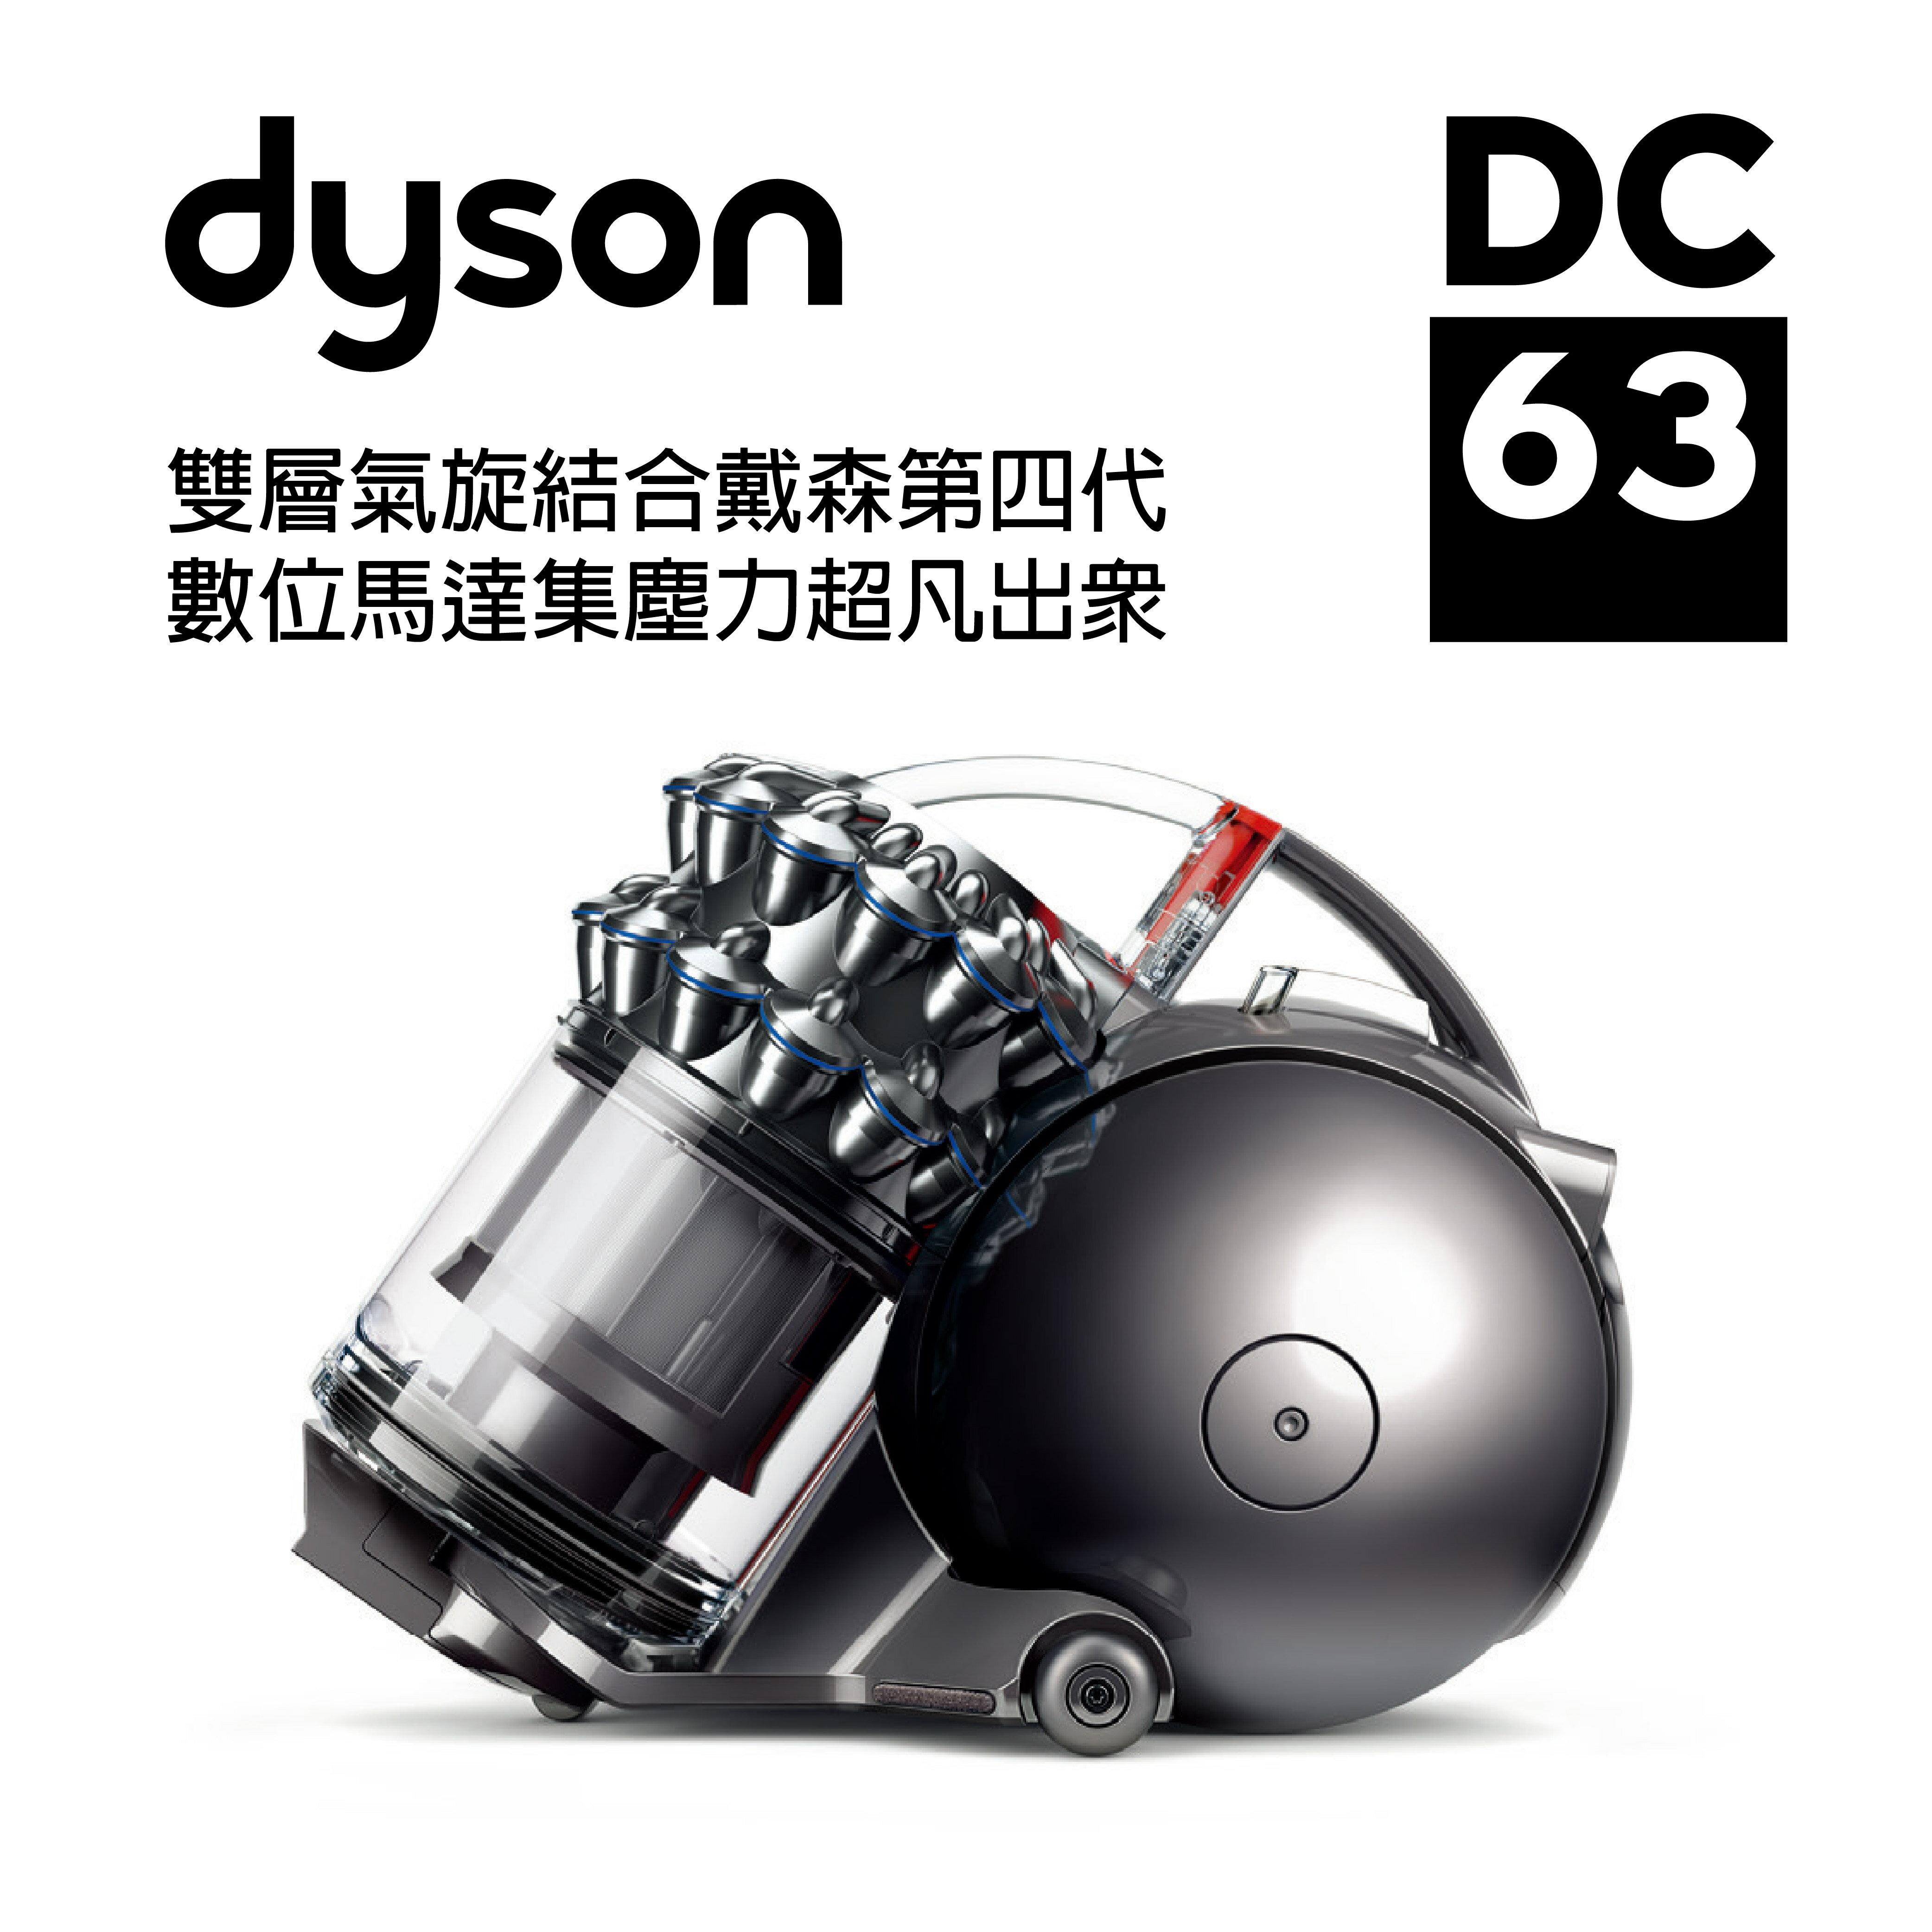 【dyson】DC63 turbinerhead 圓筒式吸塵器(銀藍)